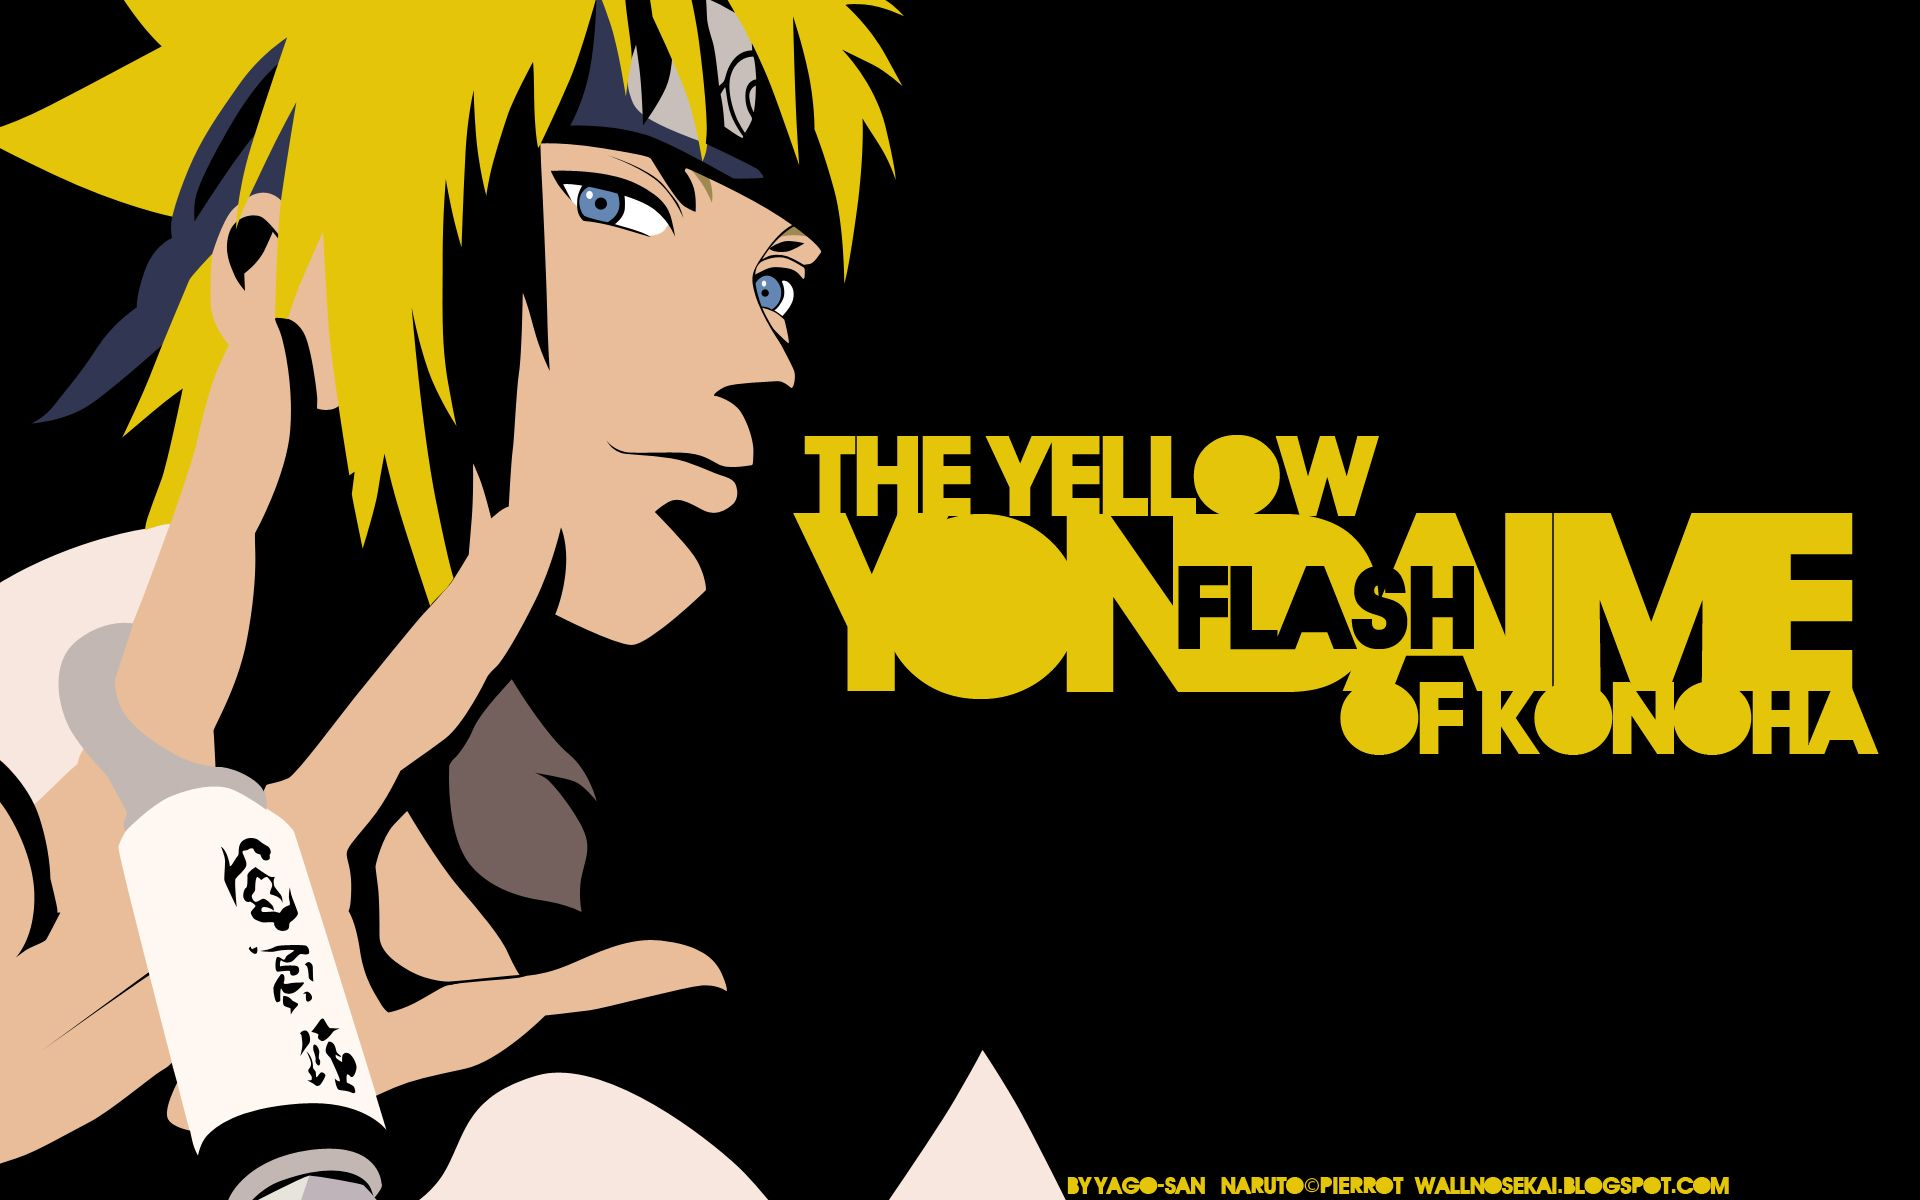 Good Wallpaper Naruto Cartoon - download-wallpapers-naruto-shippuden-21  Snapshot_143393.jpg